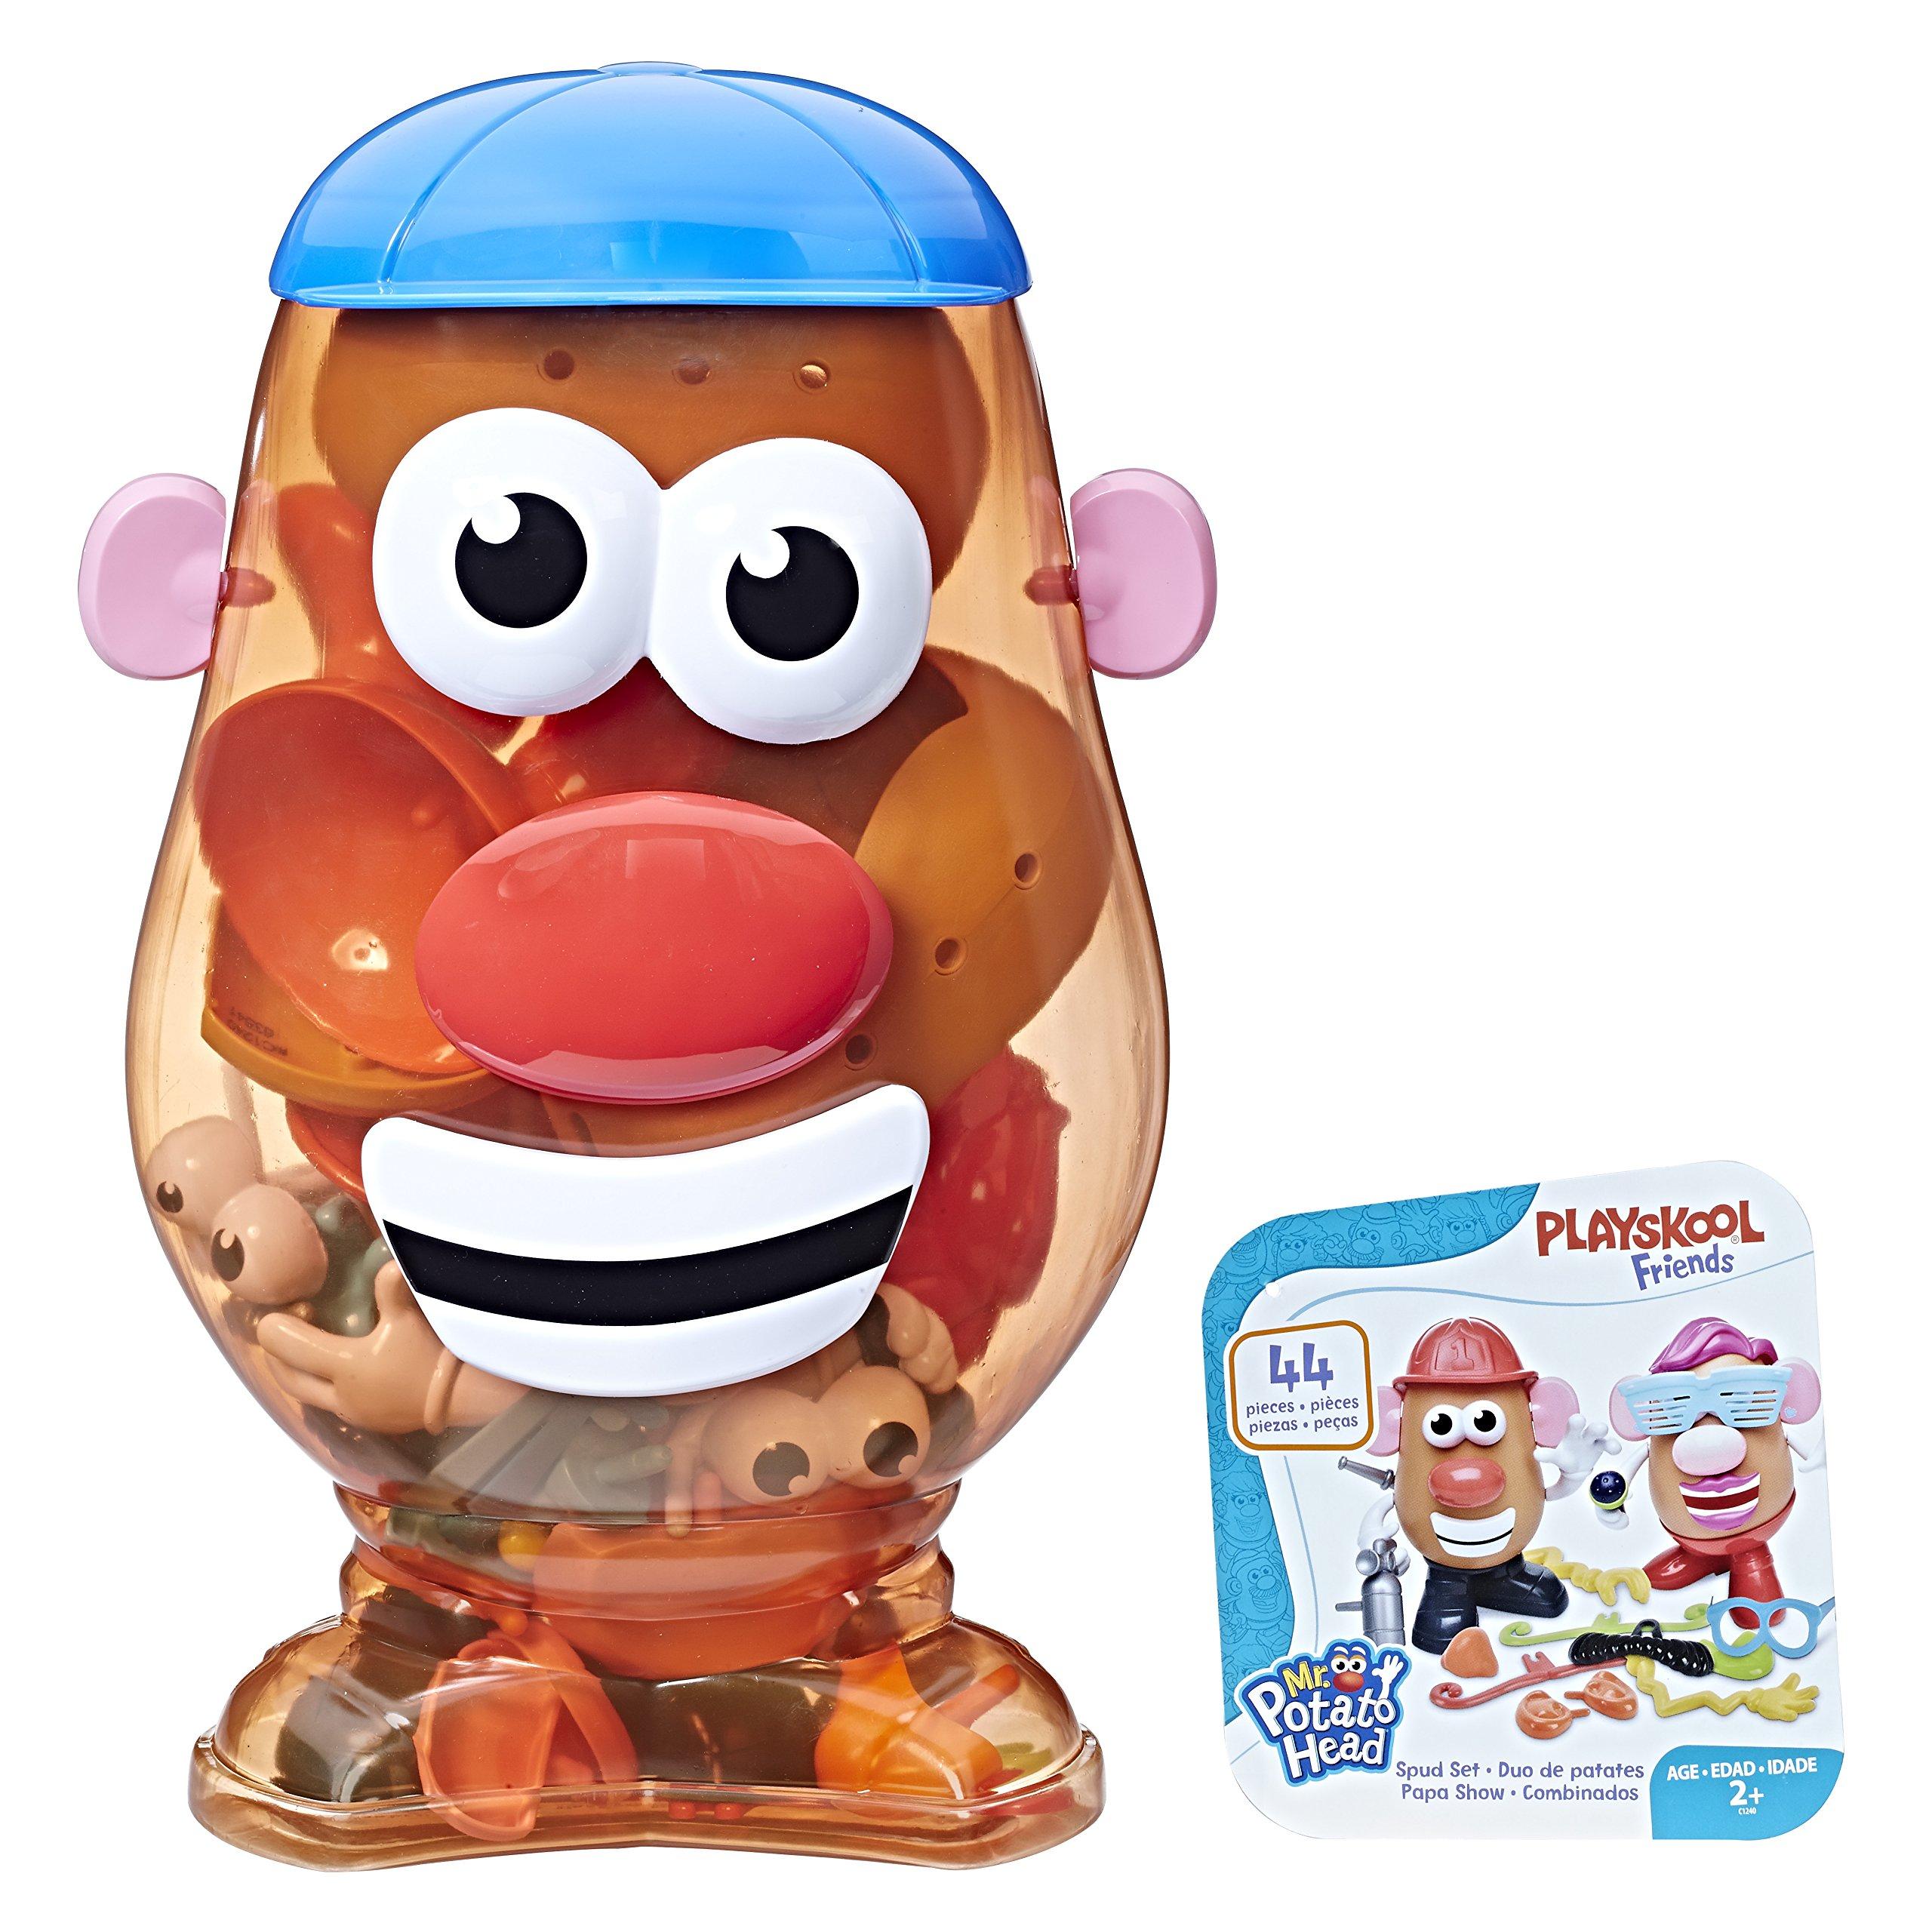 Mr. Potato Head Spud Set by HASBRO (Image #2)